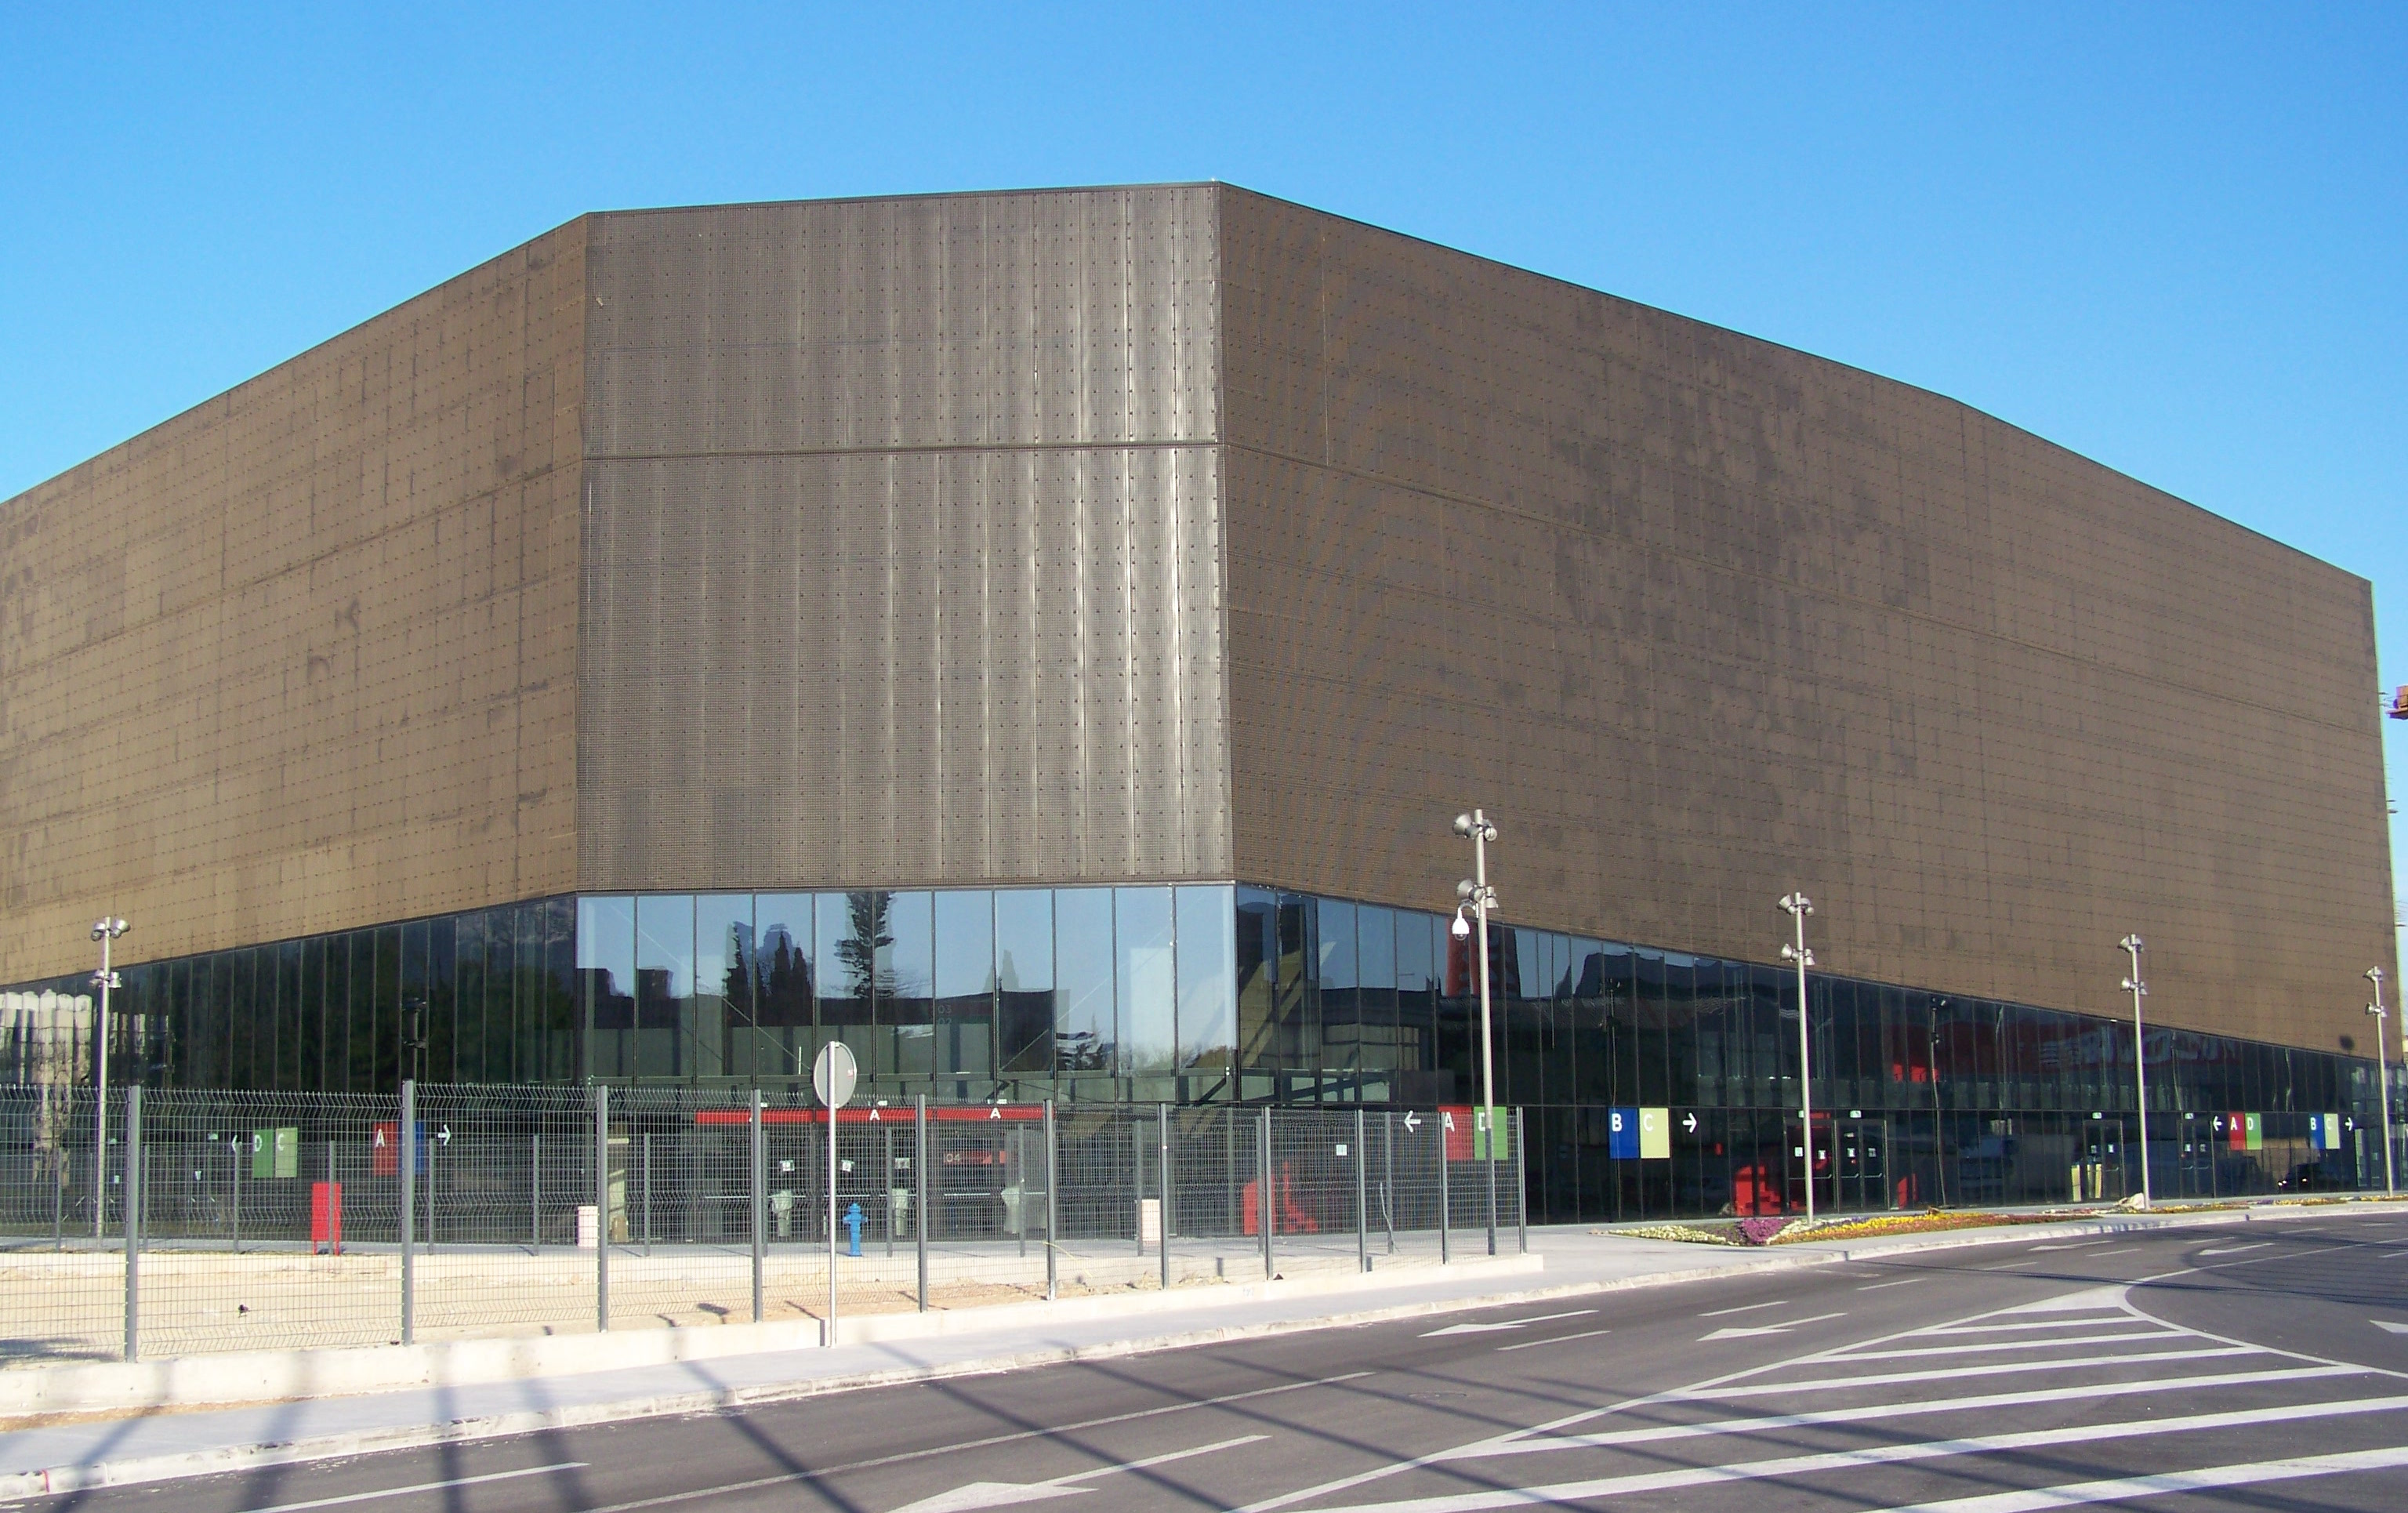 Spaladium Arena Wikipedia